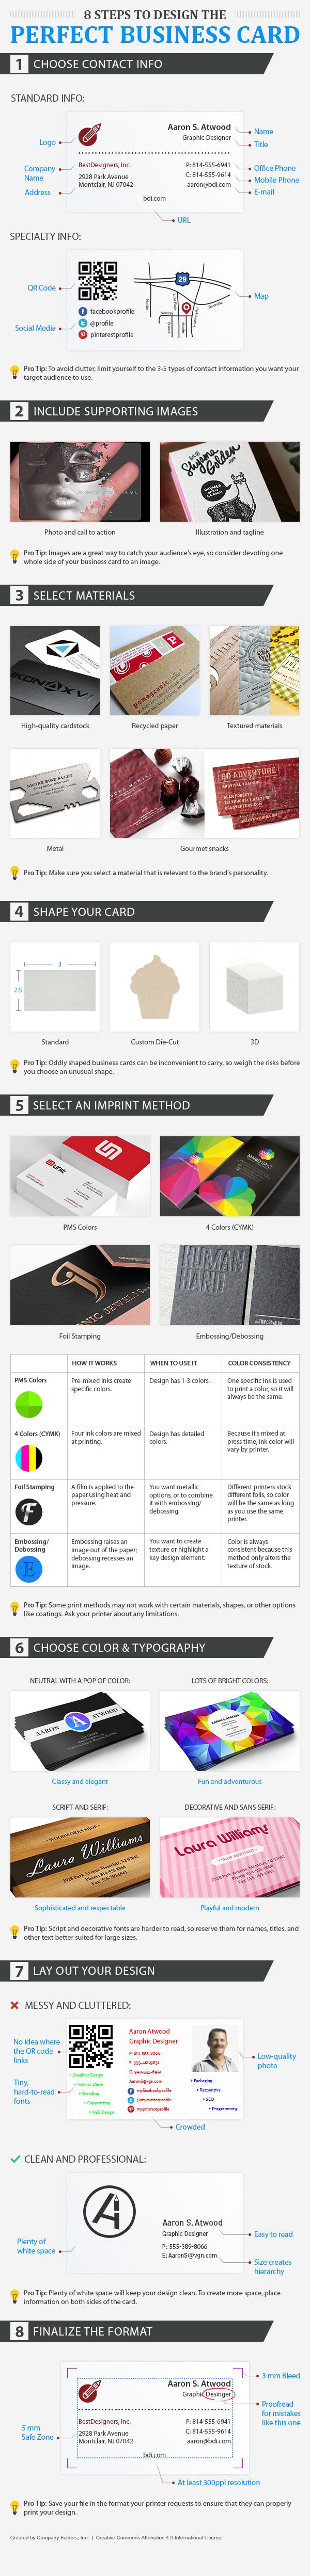 business-card-design-tips